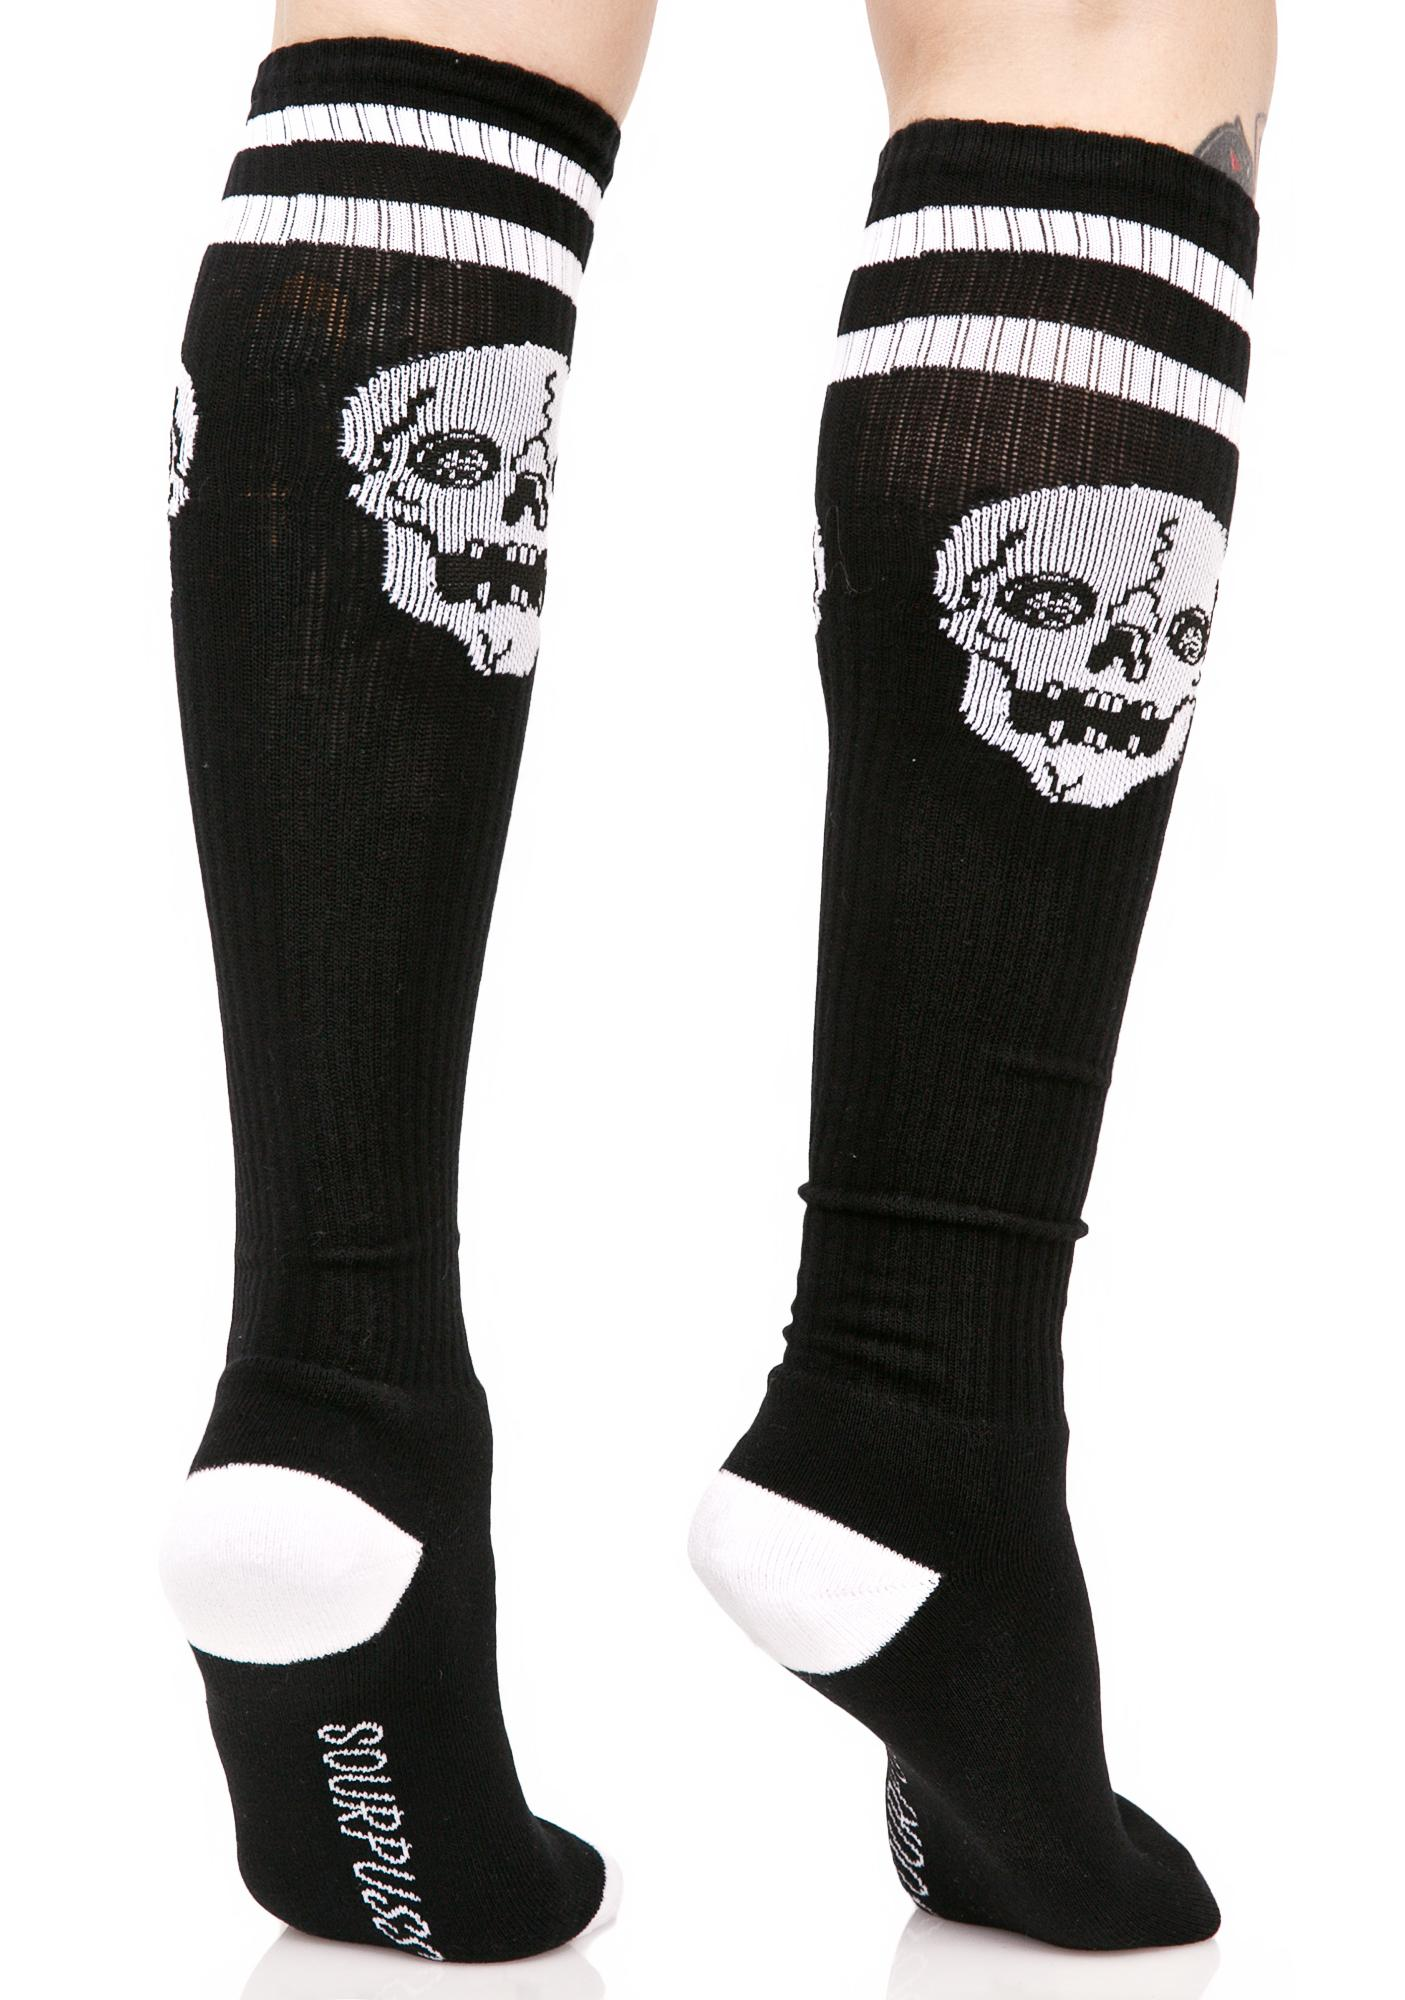 Sourpuss Clothing Skelly Knee High Socks